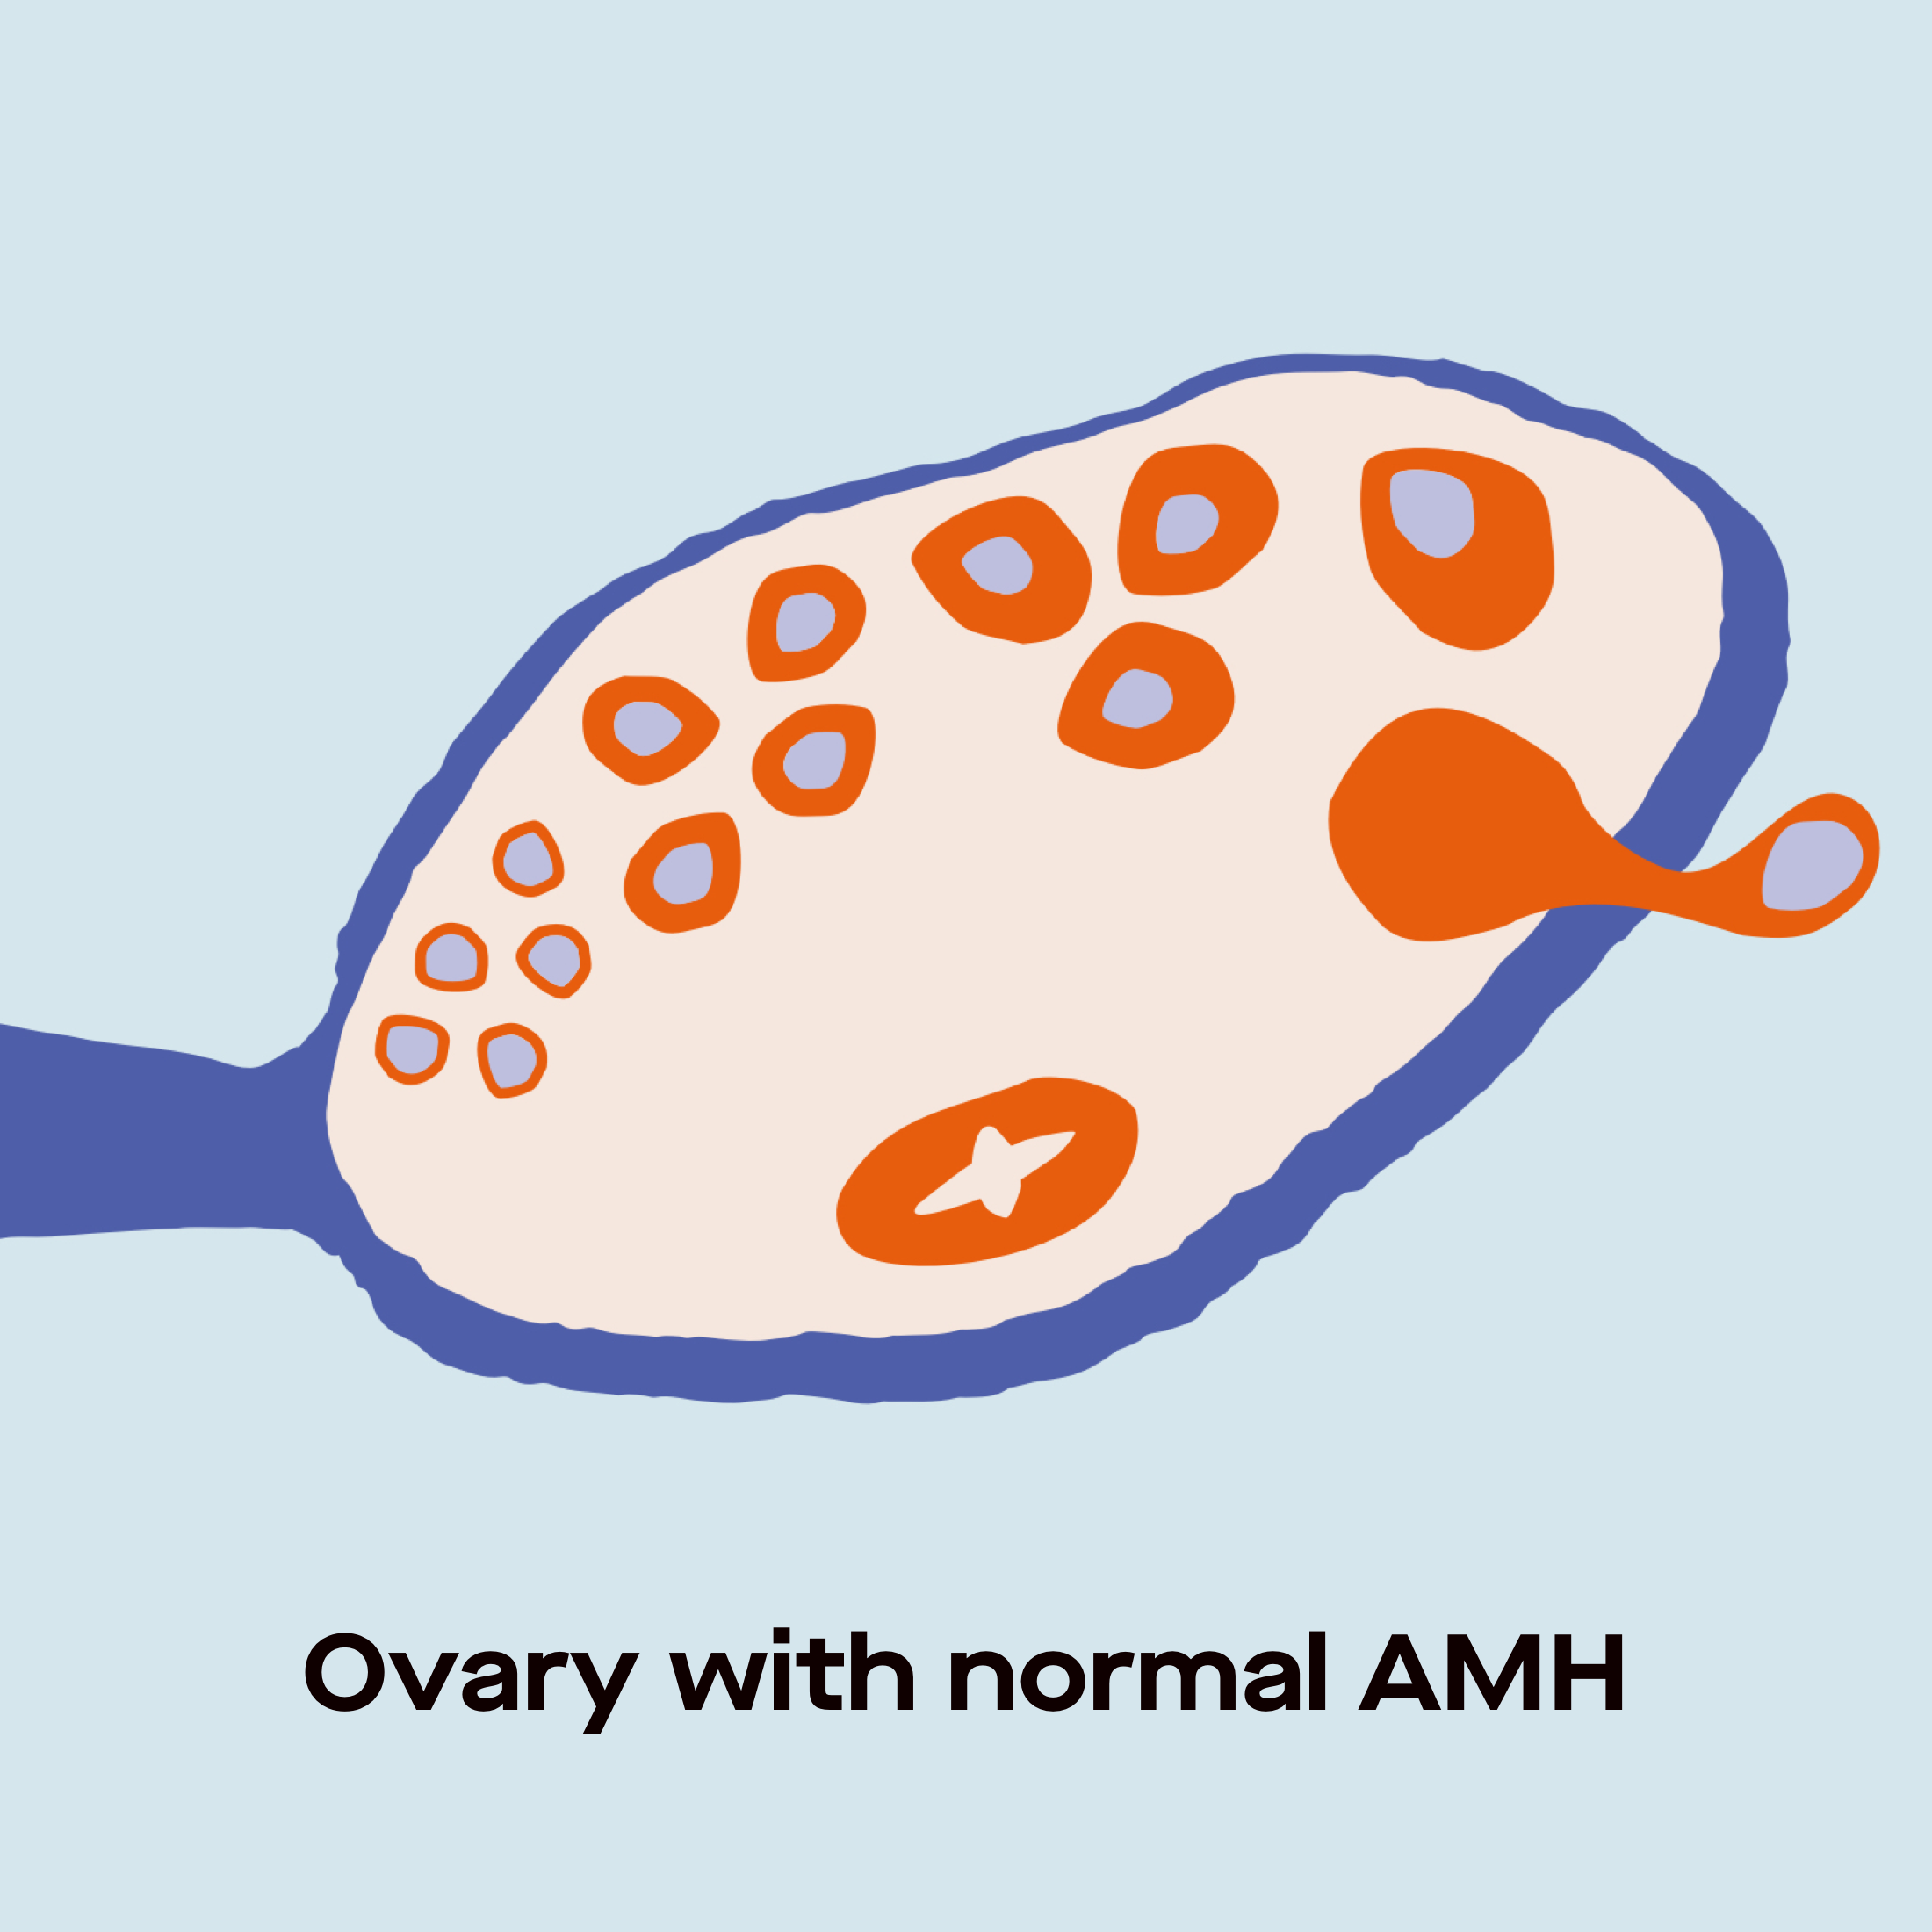 Ovary with normal AMH